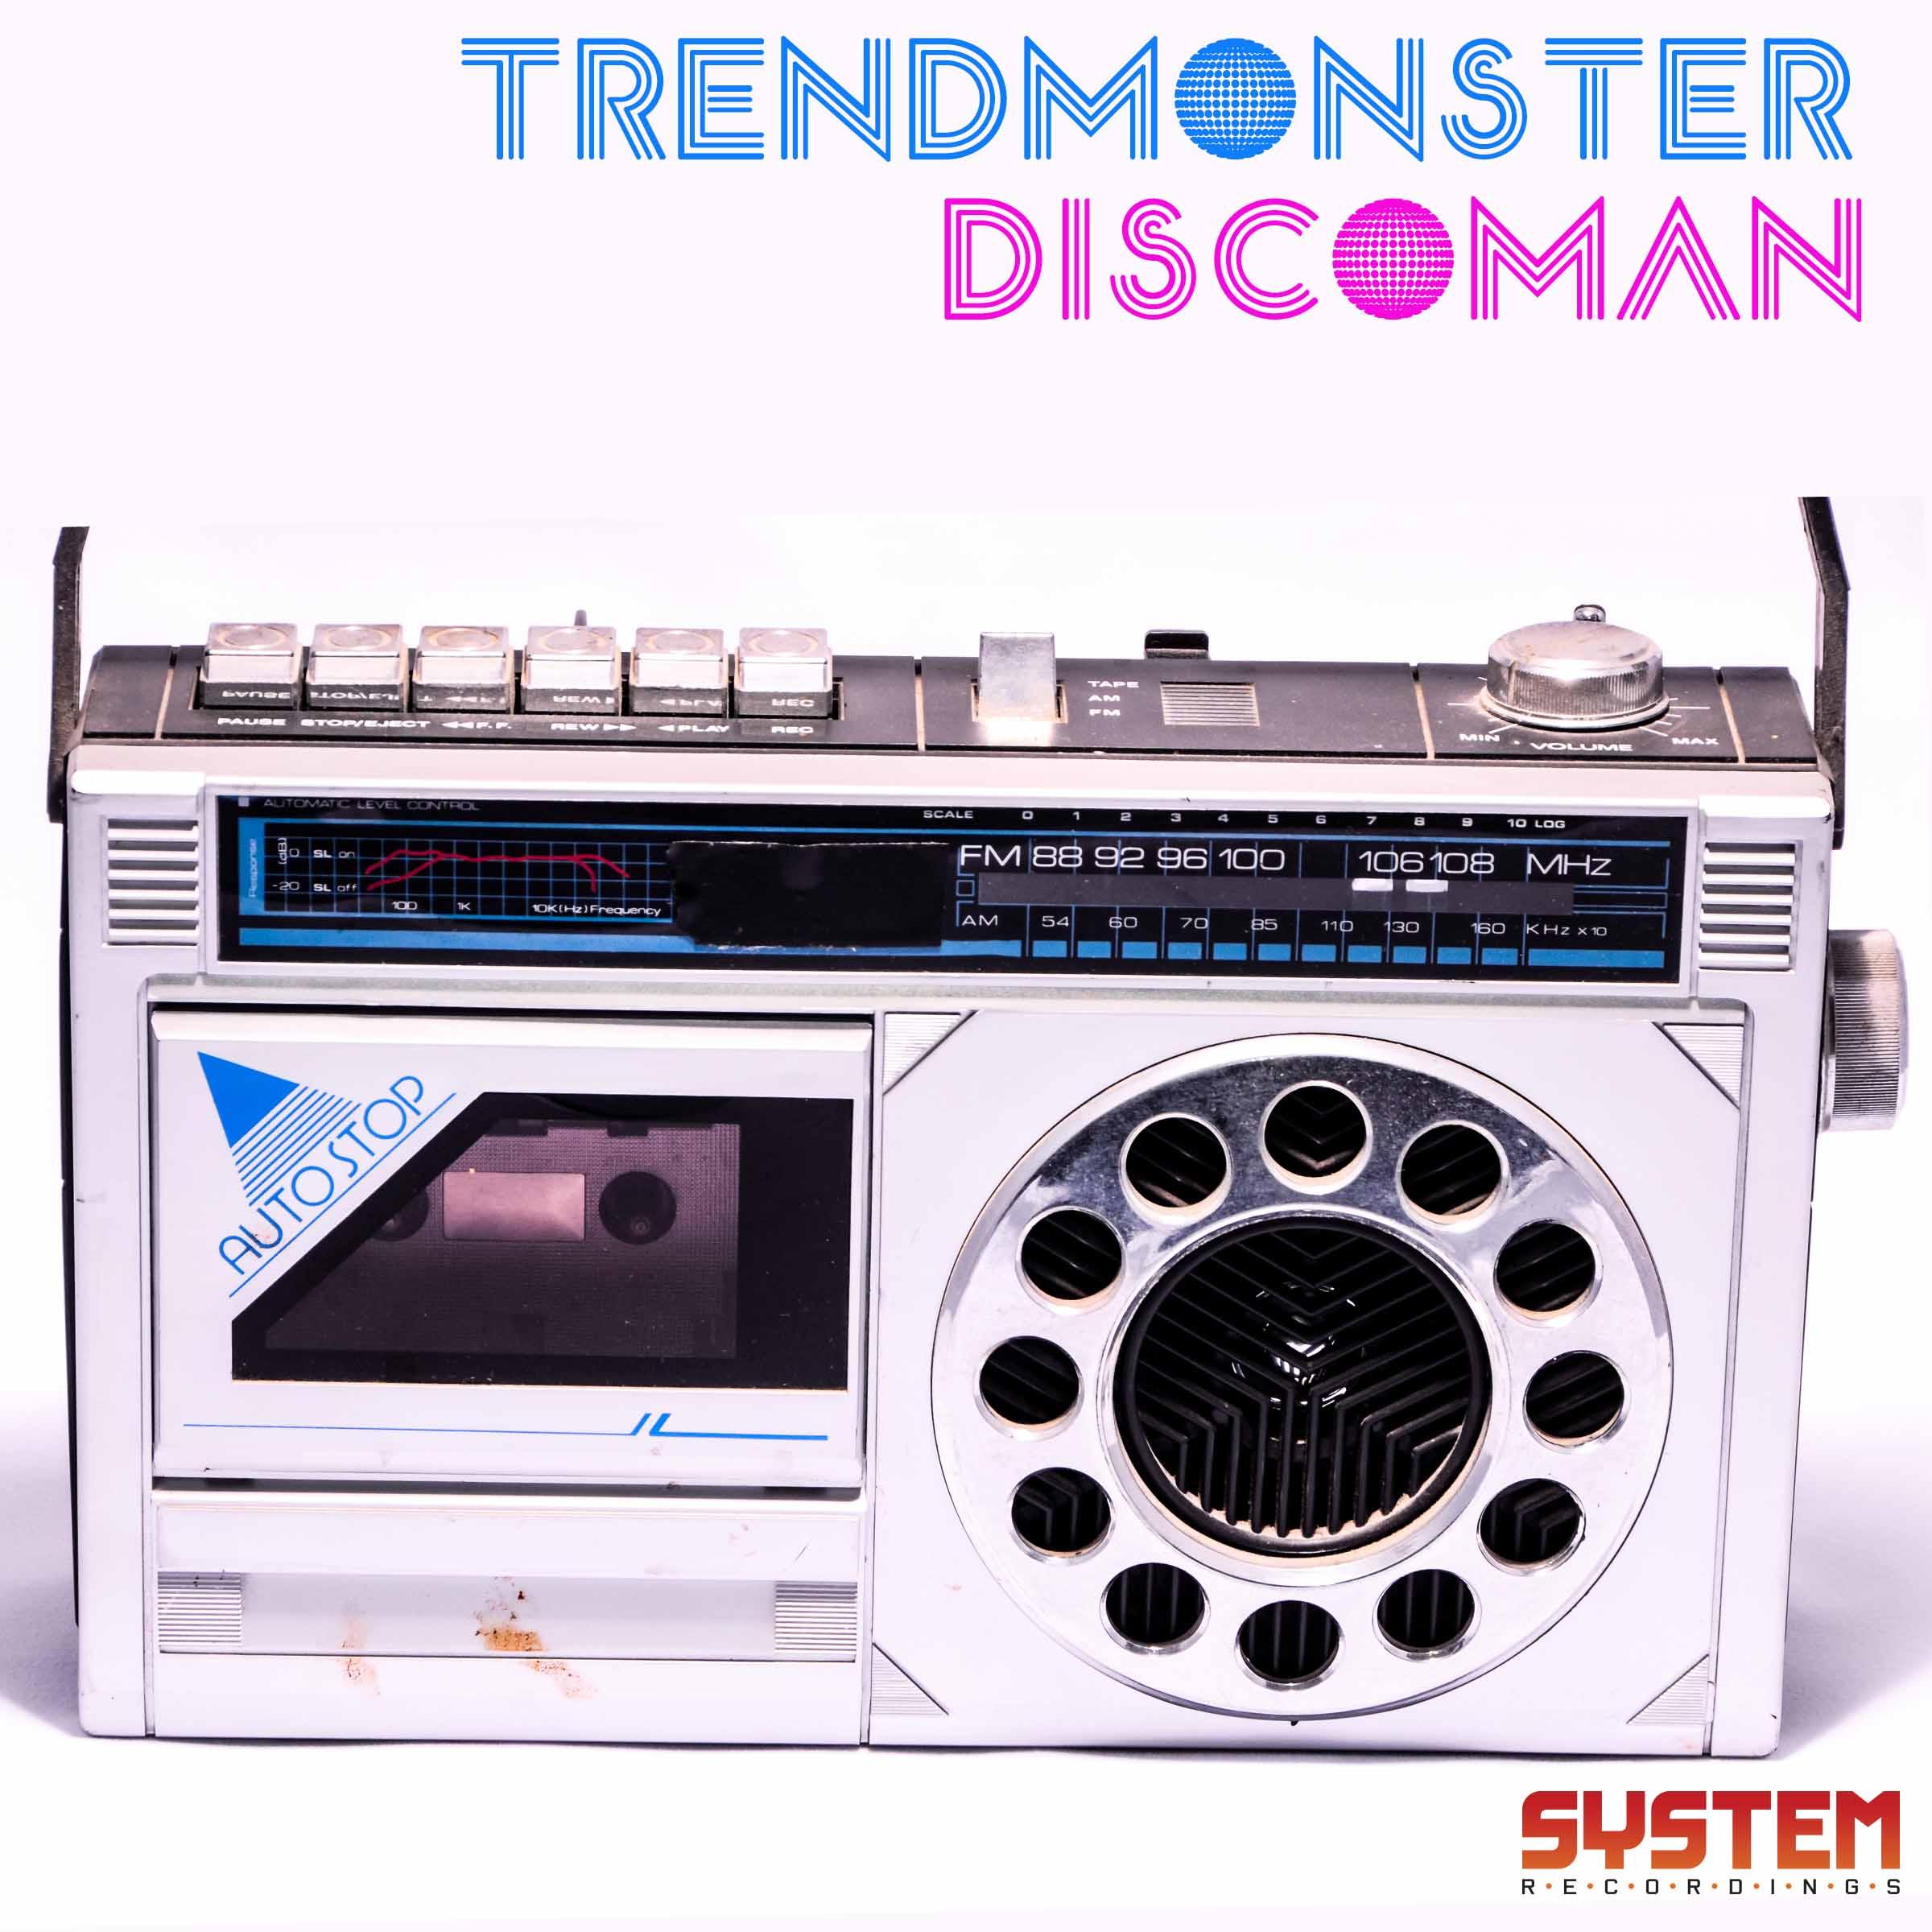 Trendmonster - Discoman